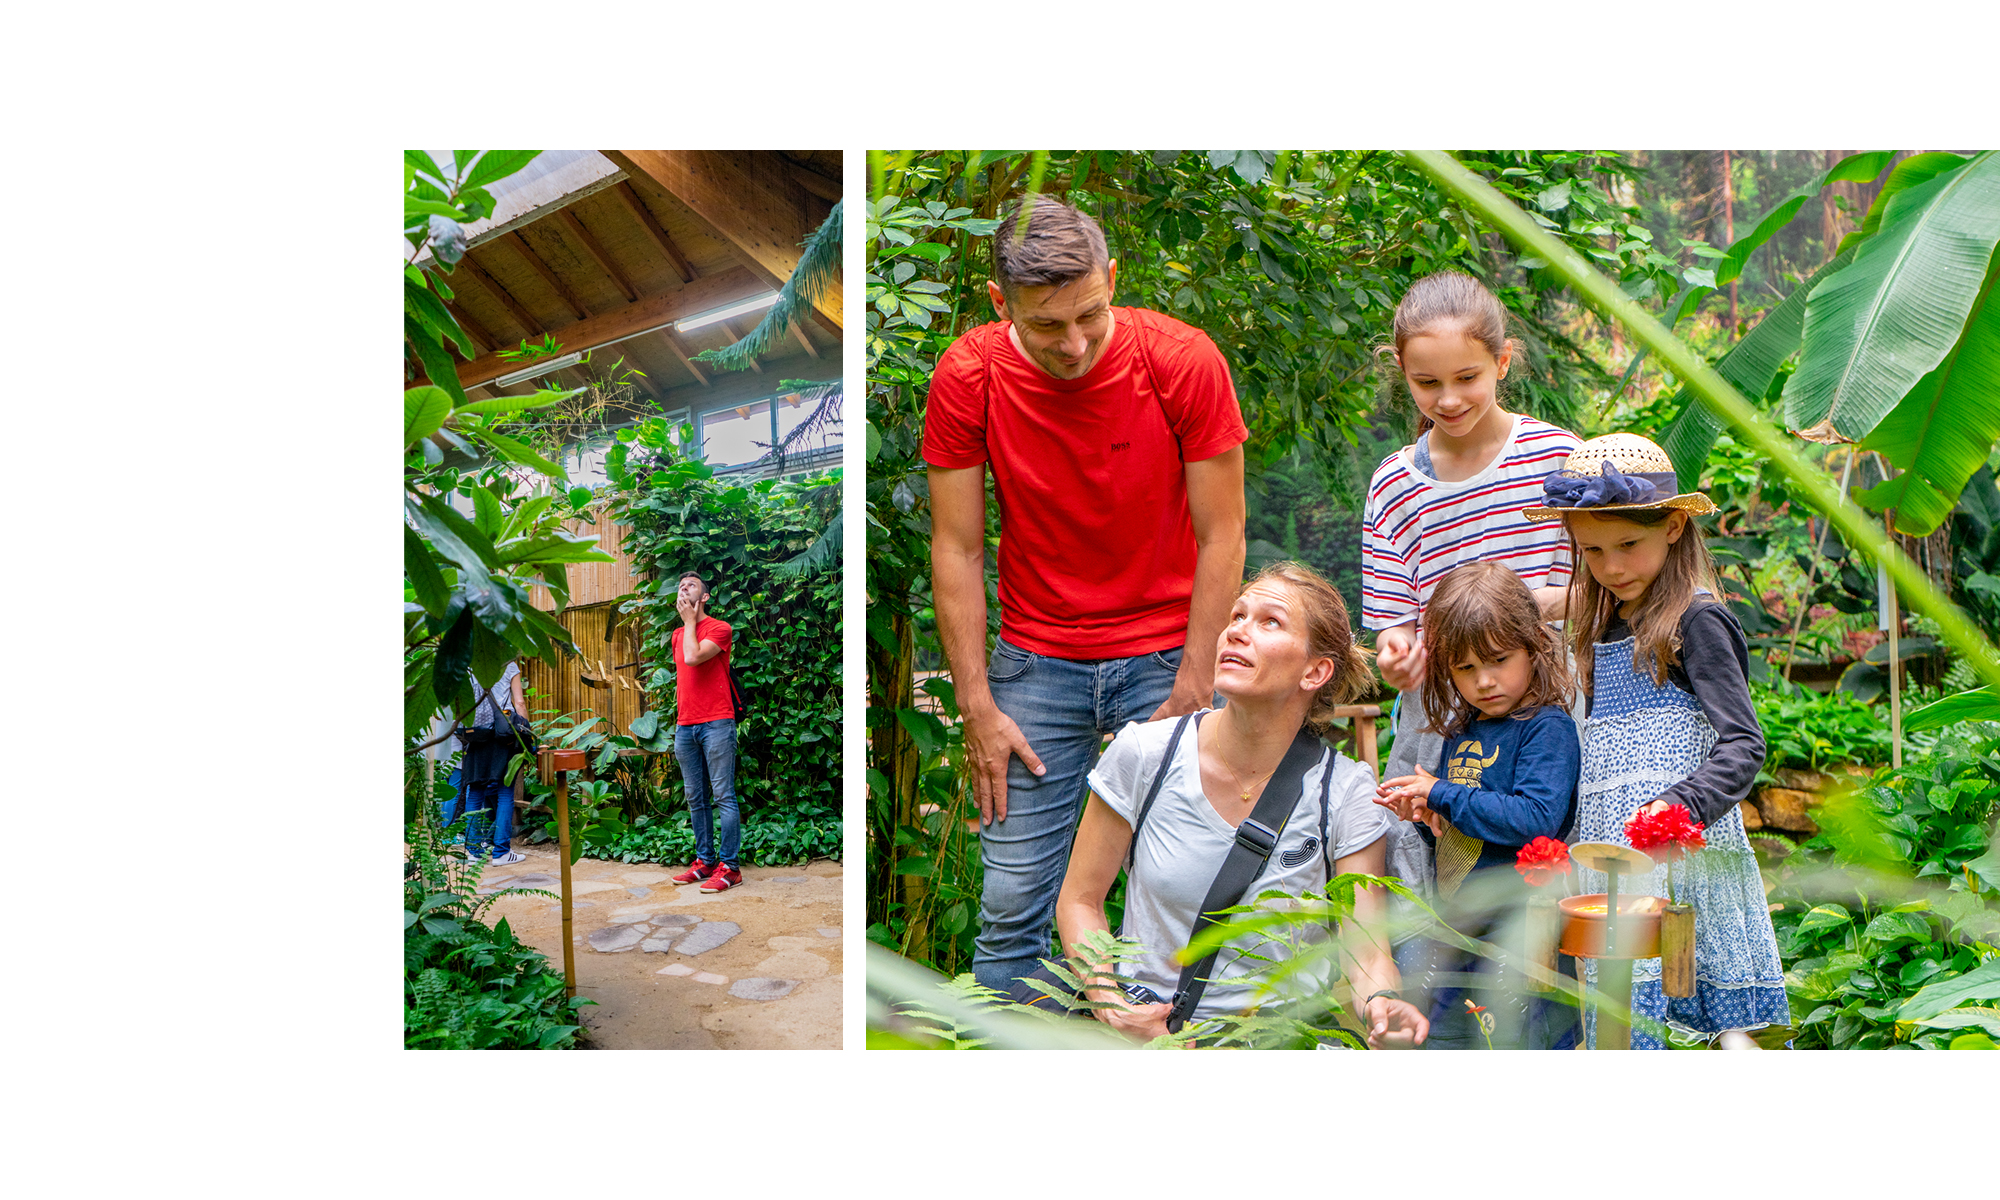 Reisebericht-Trixi-Ferienpark-03